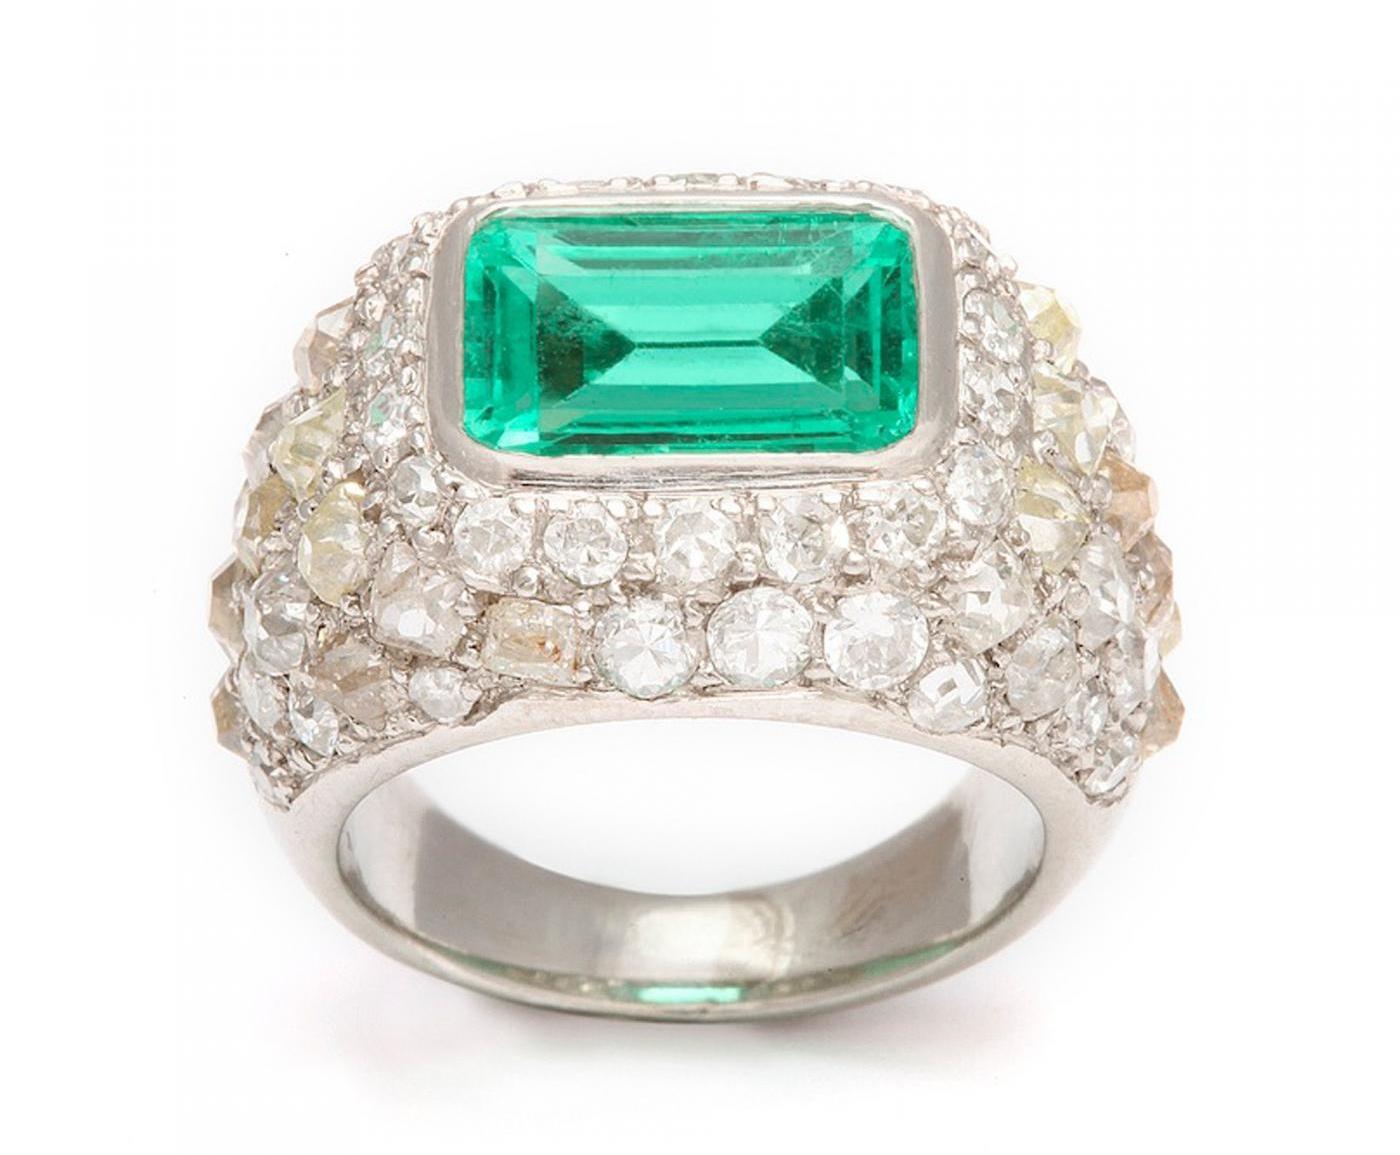 Rene-Boivin-Emerald-Diamond-Ring-in-Platinum-126757-85557